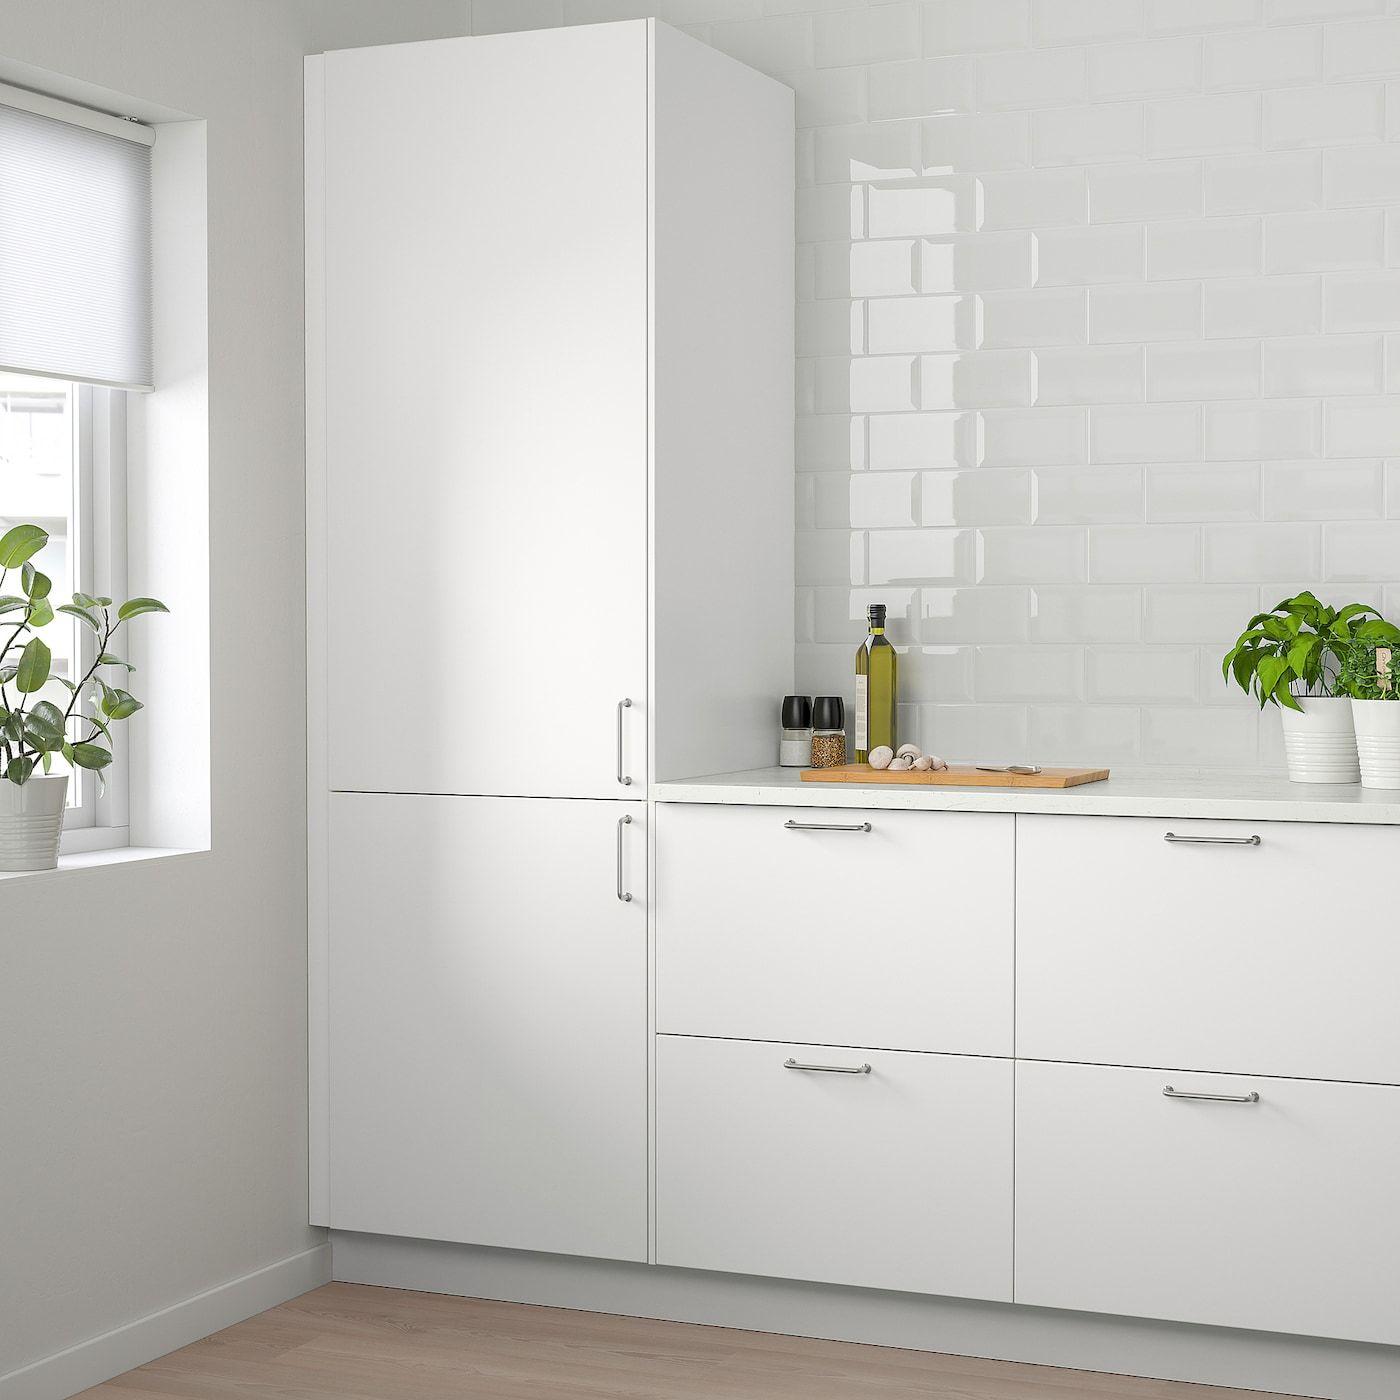 Veddinge Door White 15x60 In 2020 Popular Kitchen Designs Modern Kitchen Doors Kitchen Design